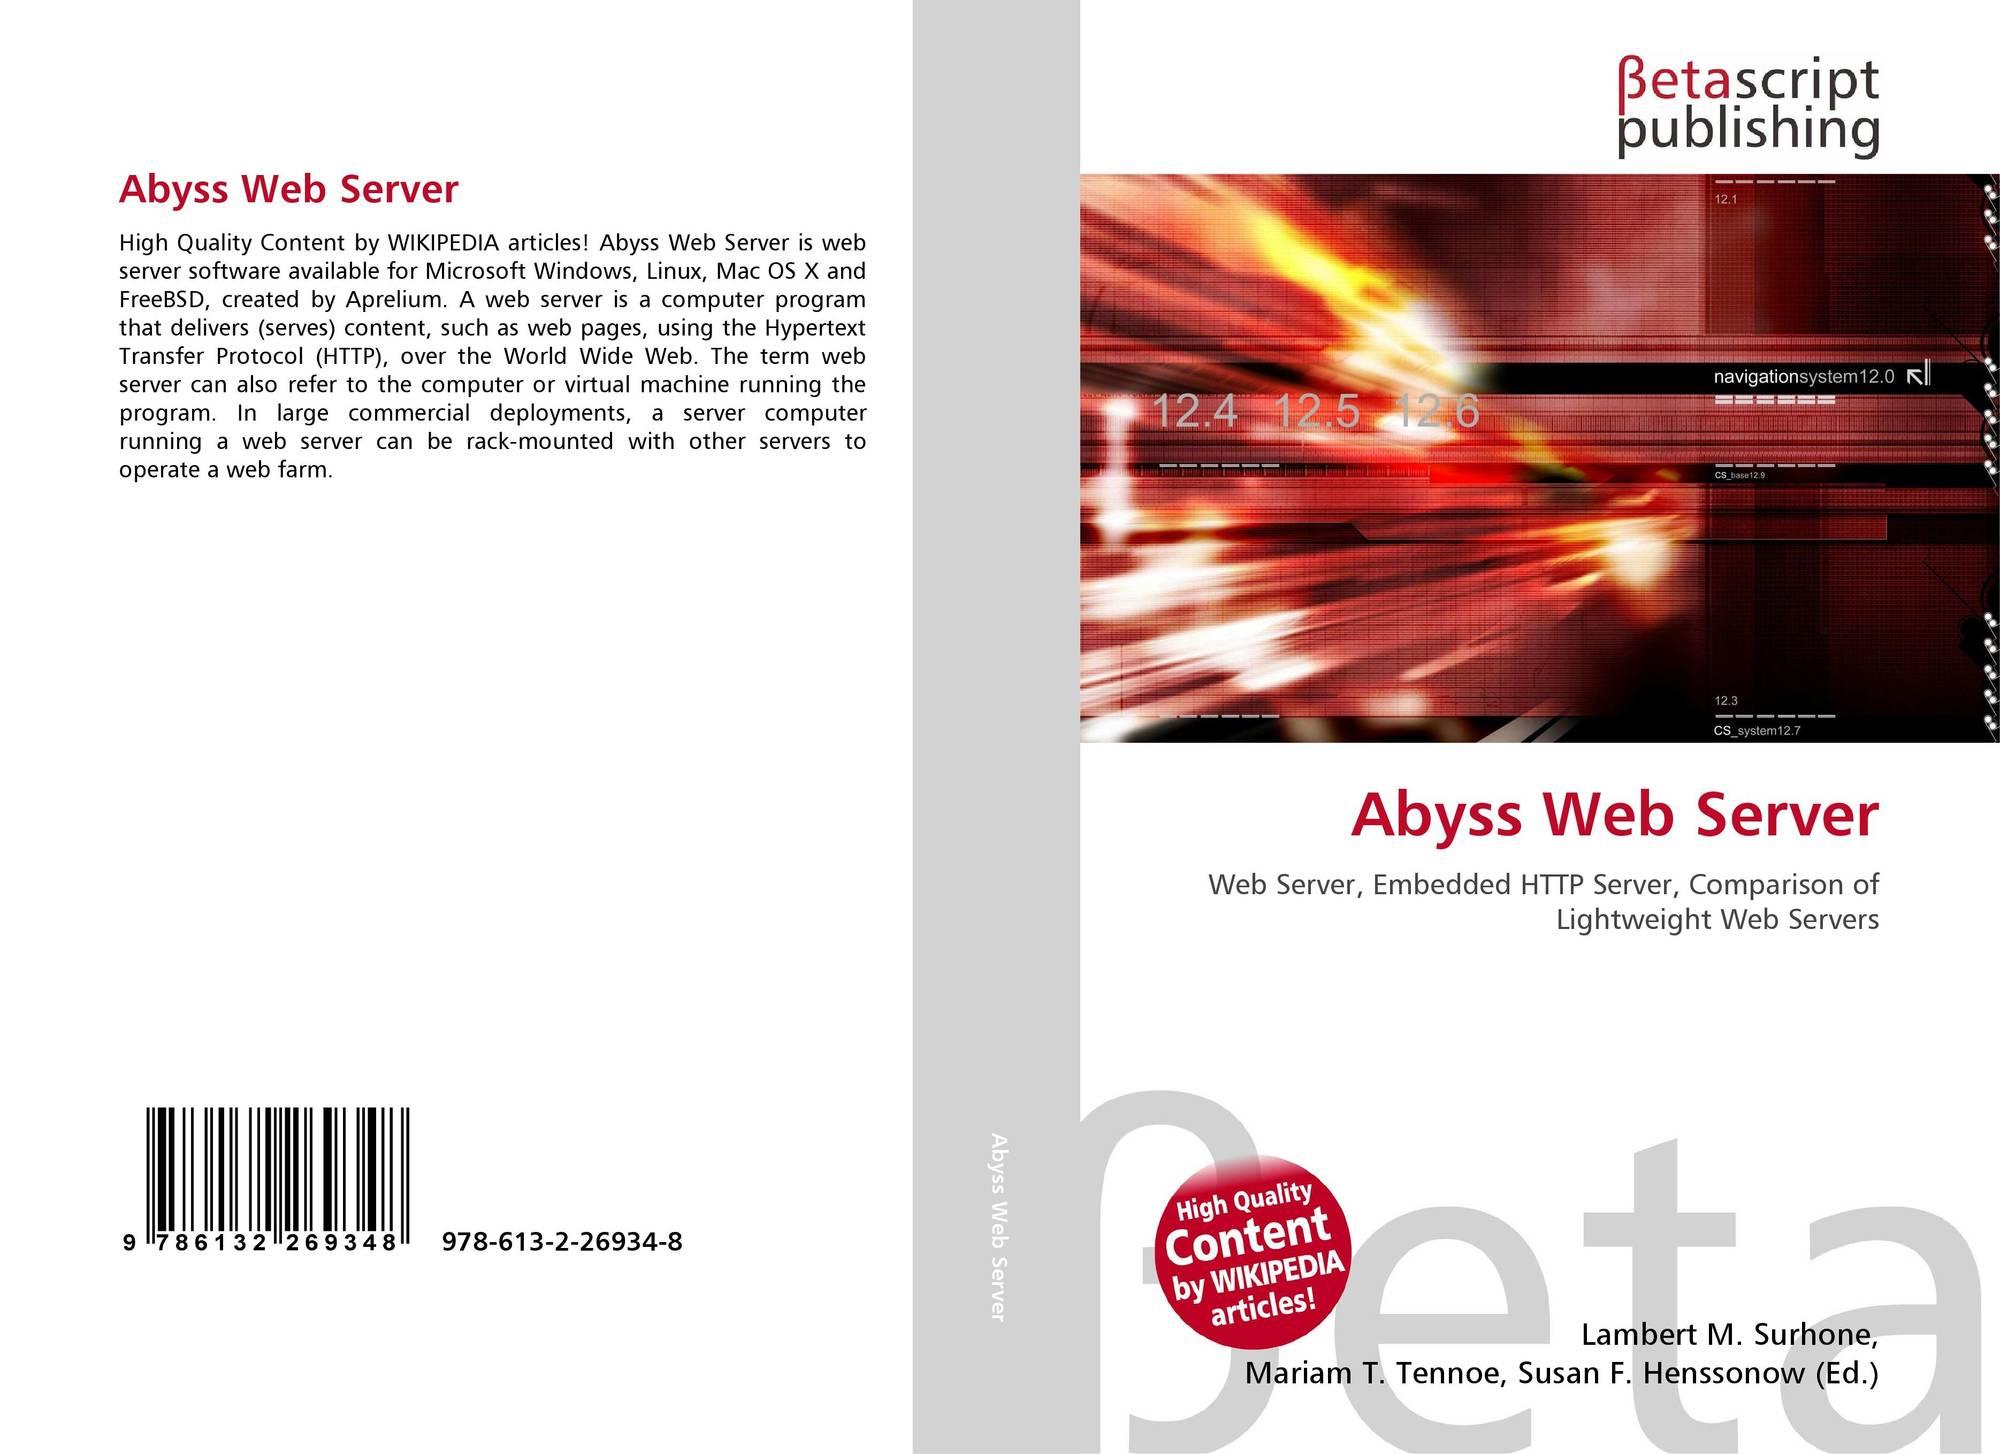 Abyss Web Server, 978-613-2-26934-8, 6132269347 ,9786132269348